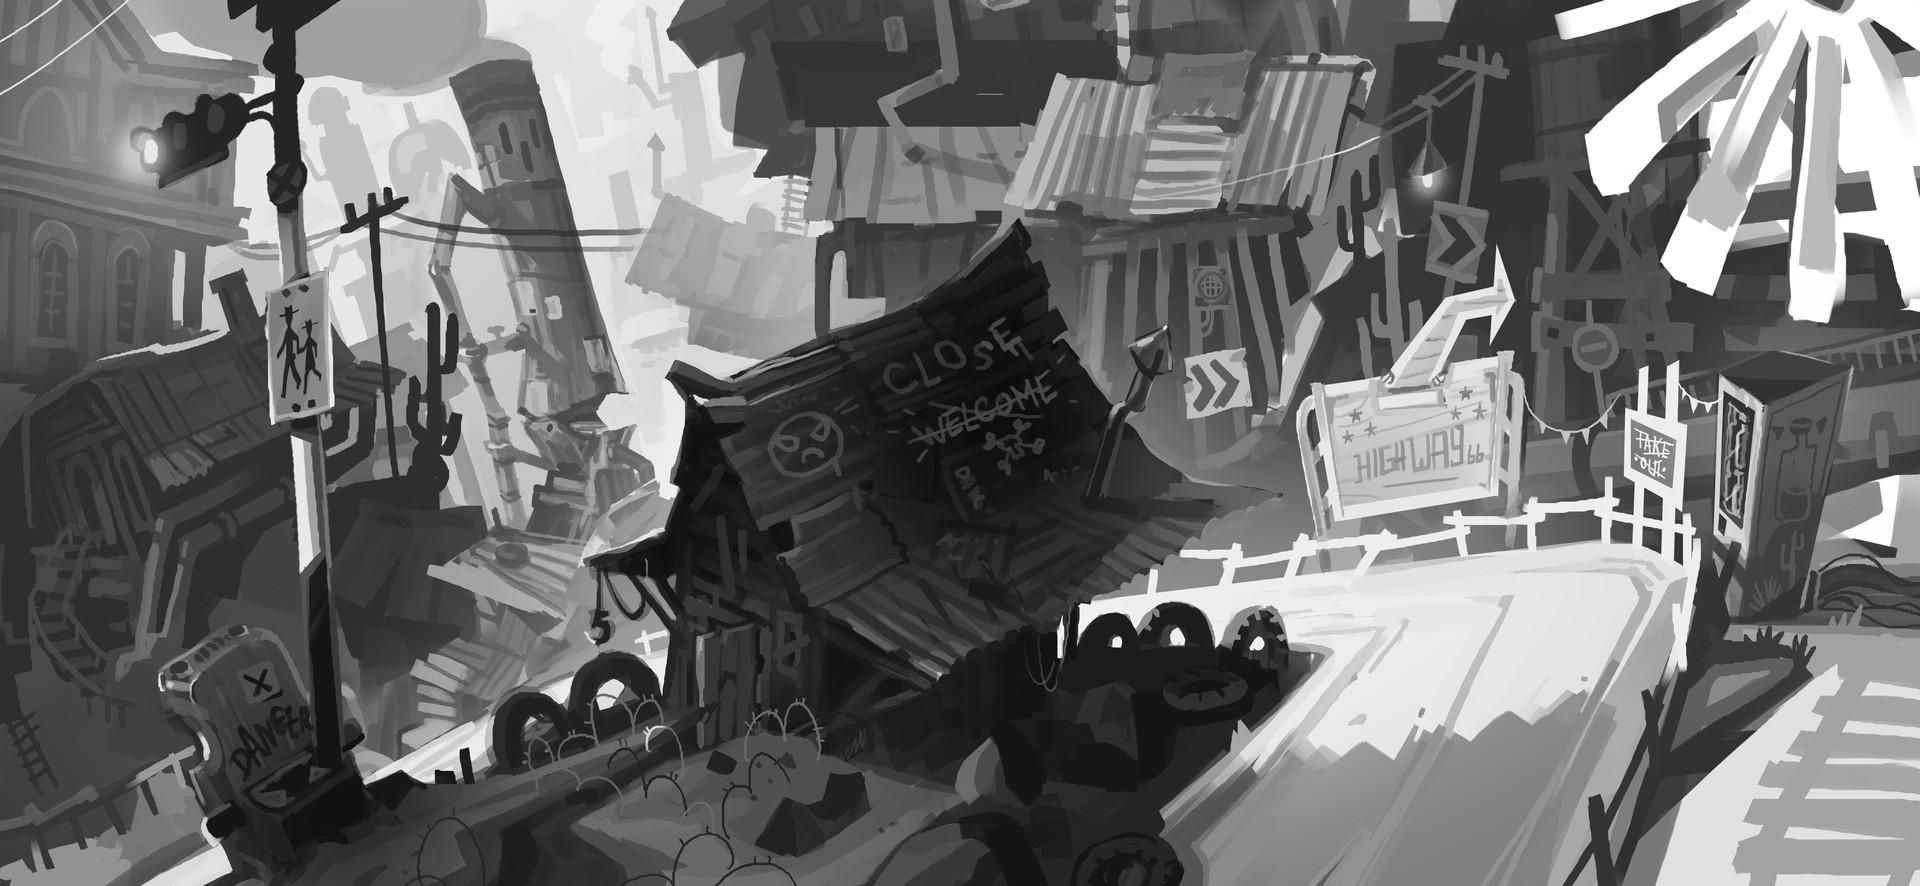 Tokkun studio enviro citywestern regis mirof2